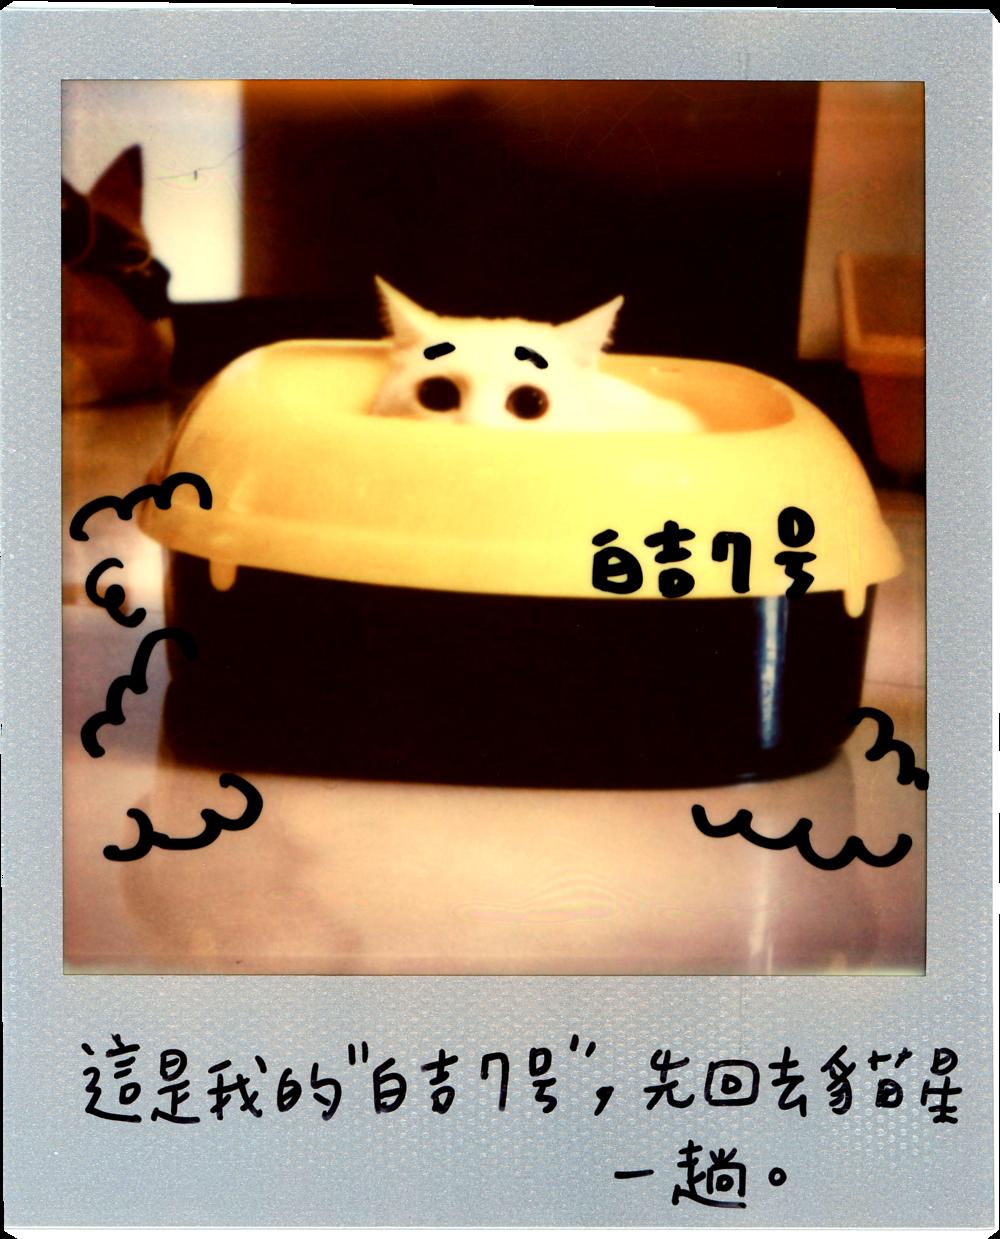 0707-2014-白吉-字5.png